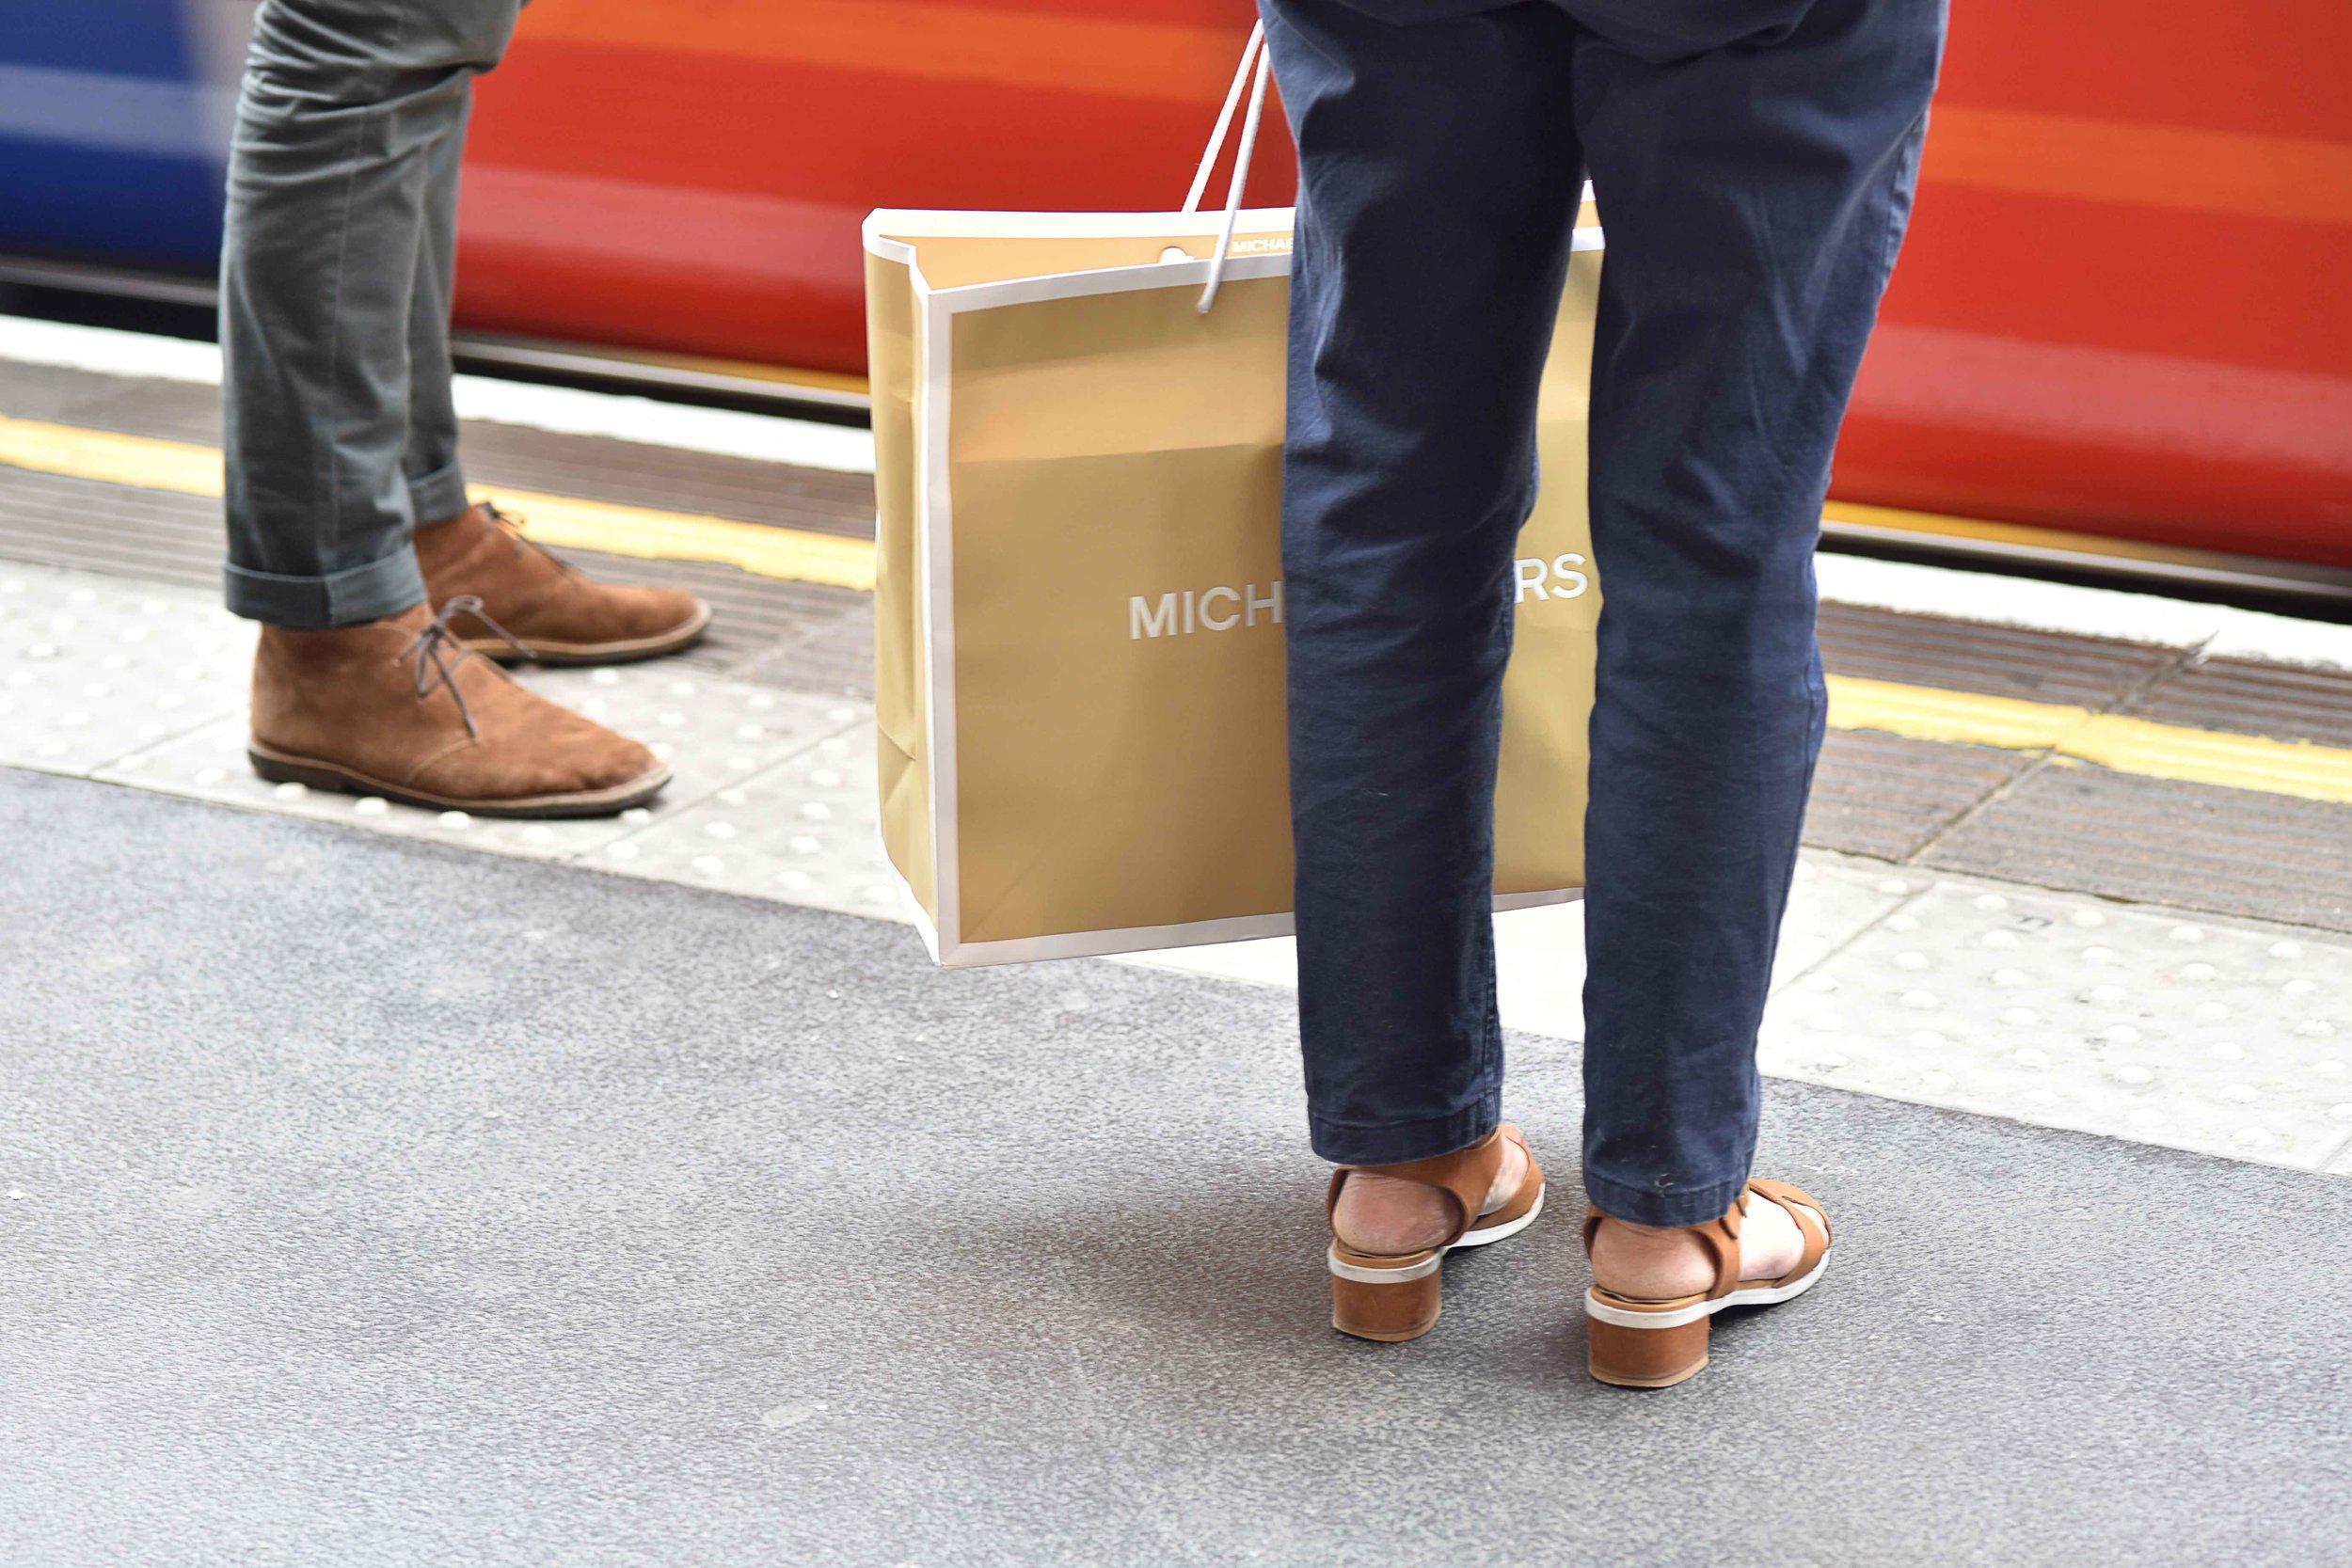 Michael Kors shopping bag, London tube, London, U.K. Image©sourcingstyle.com